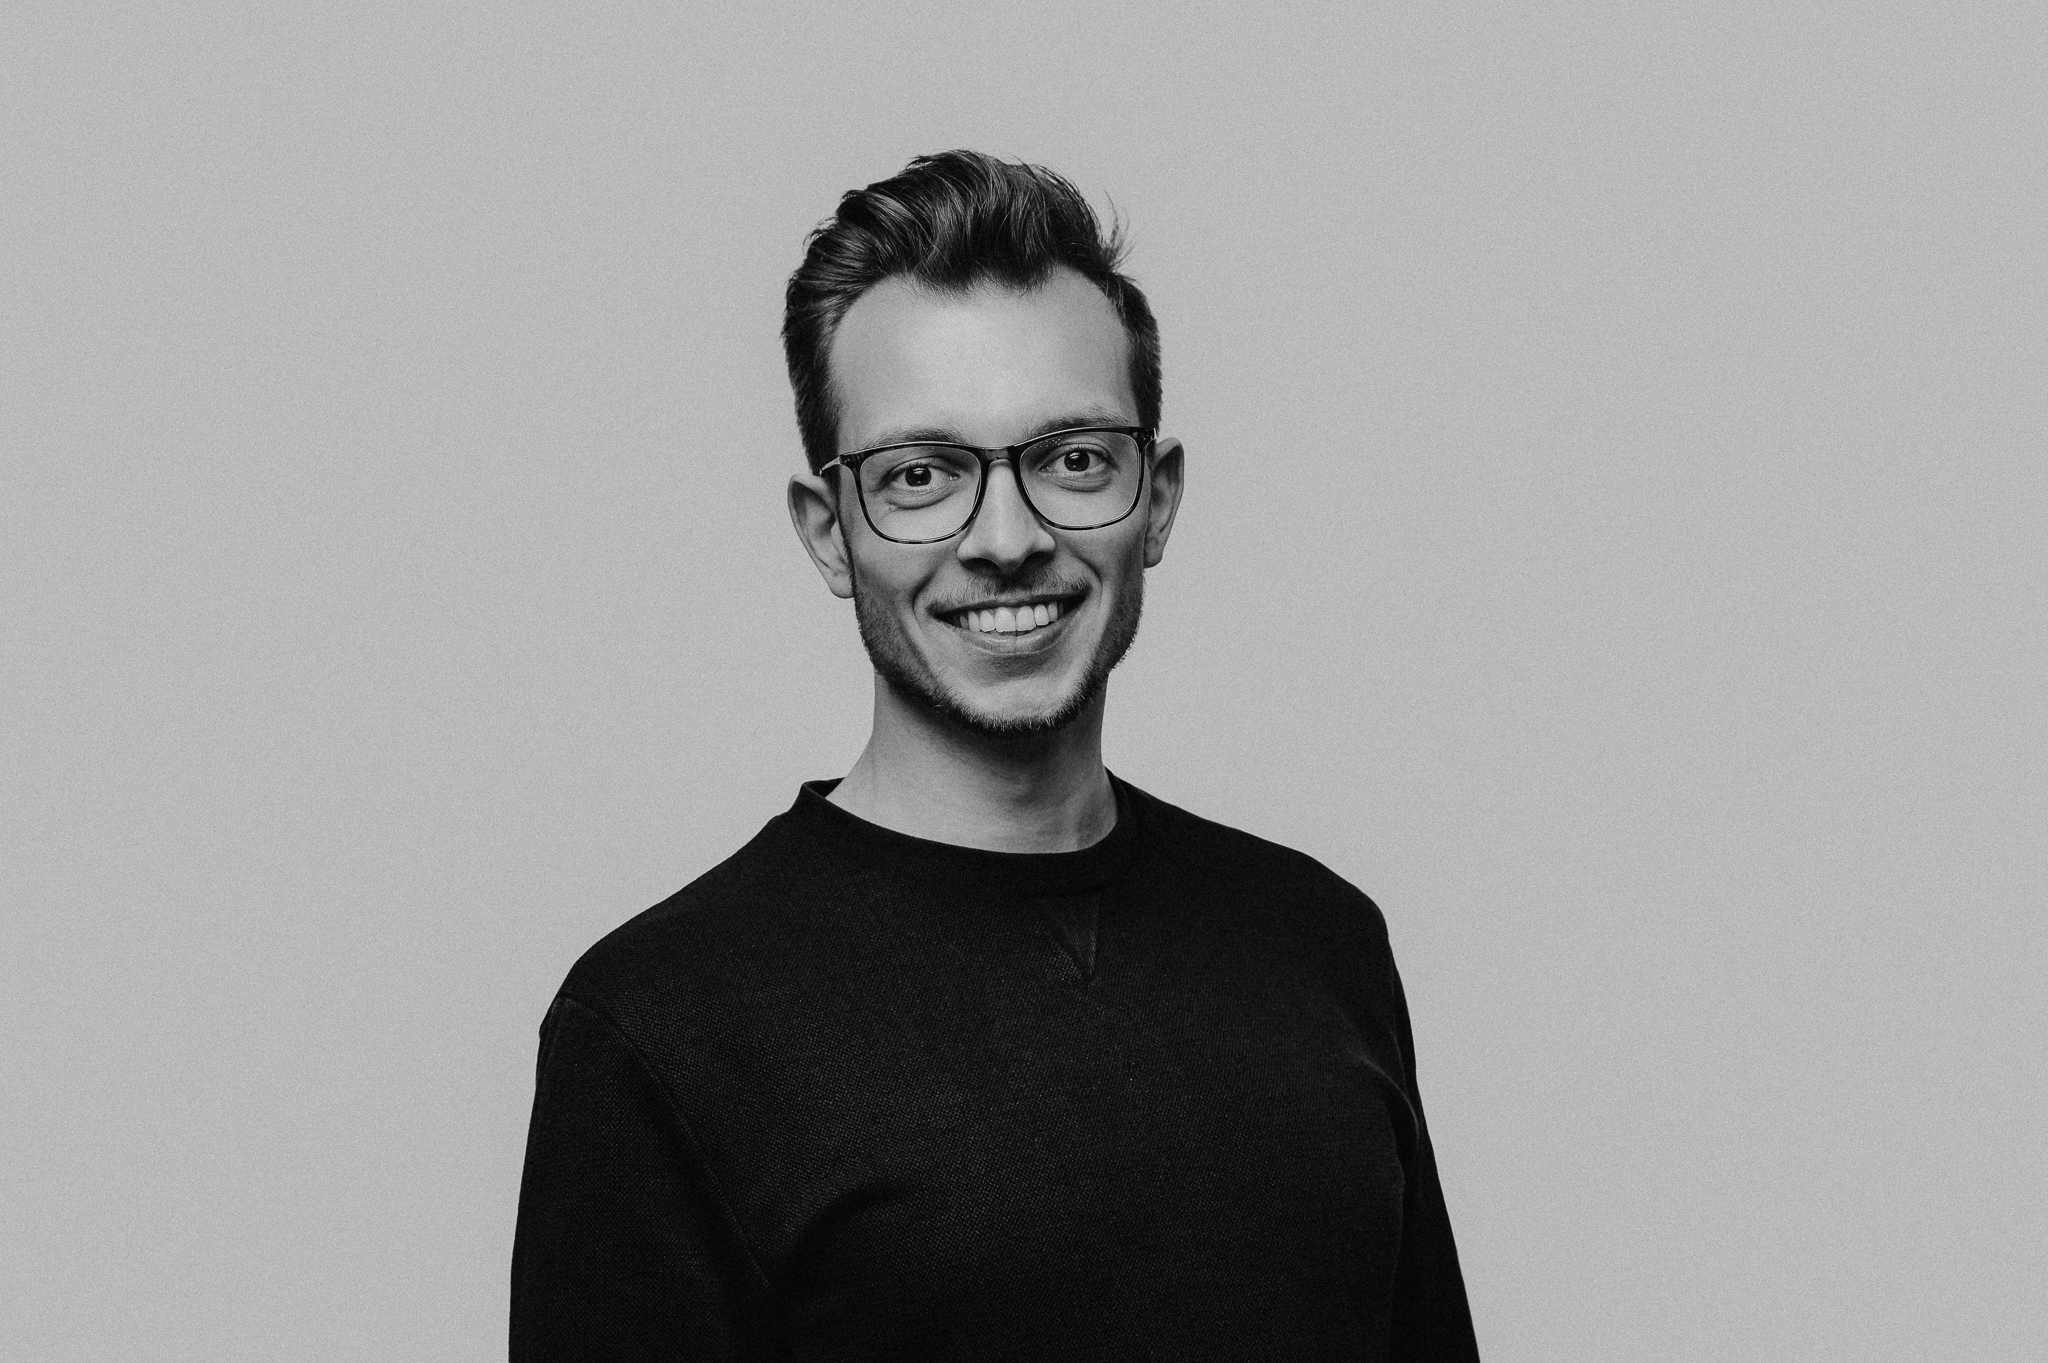 Steven-Sch-Profil-WEB-2